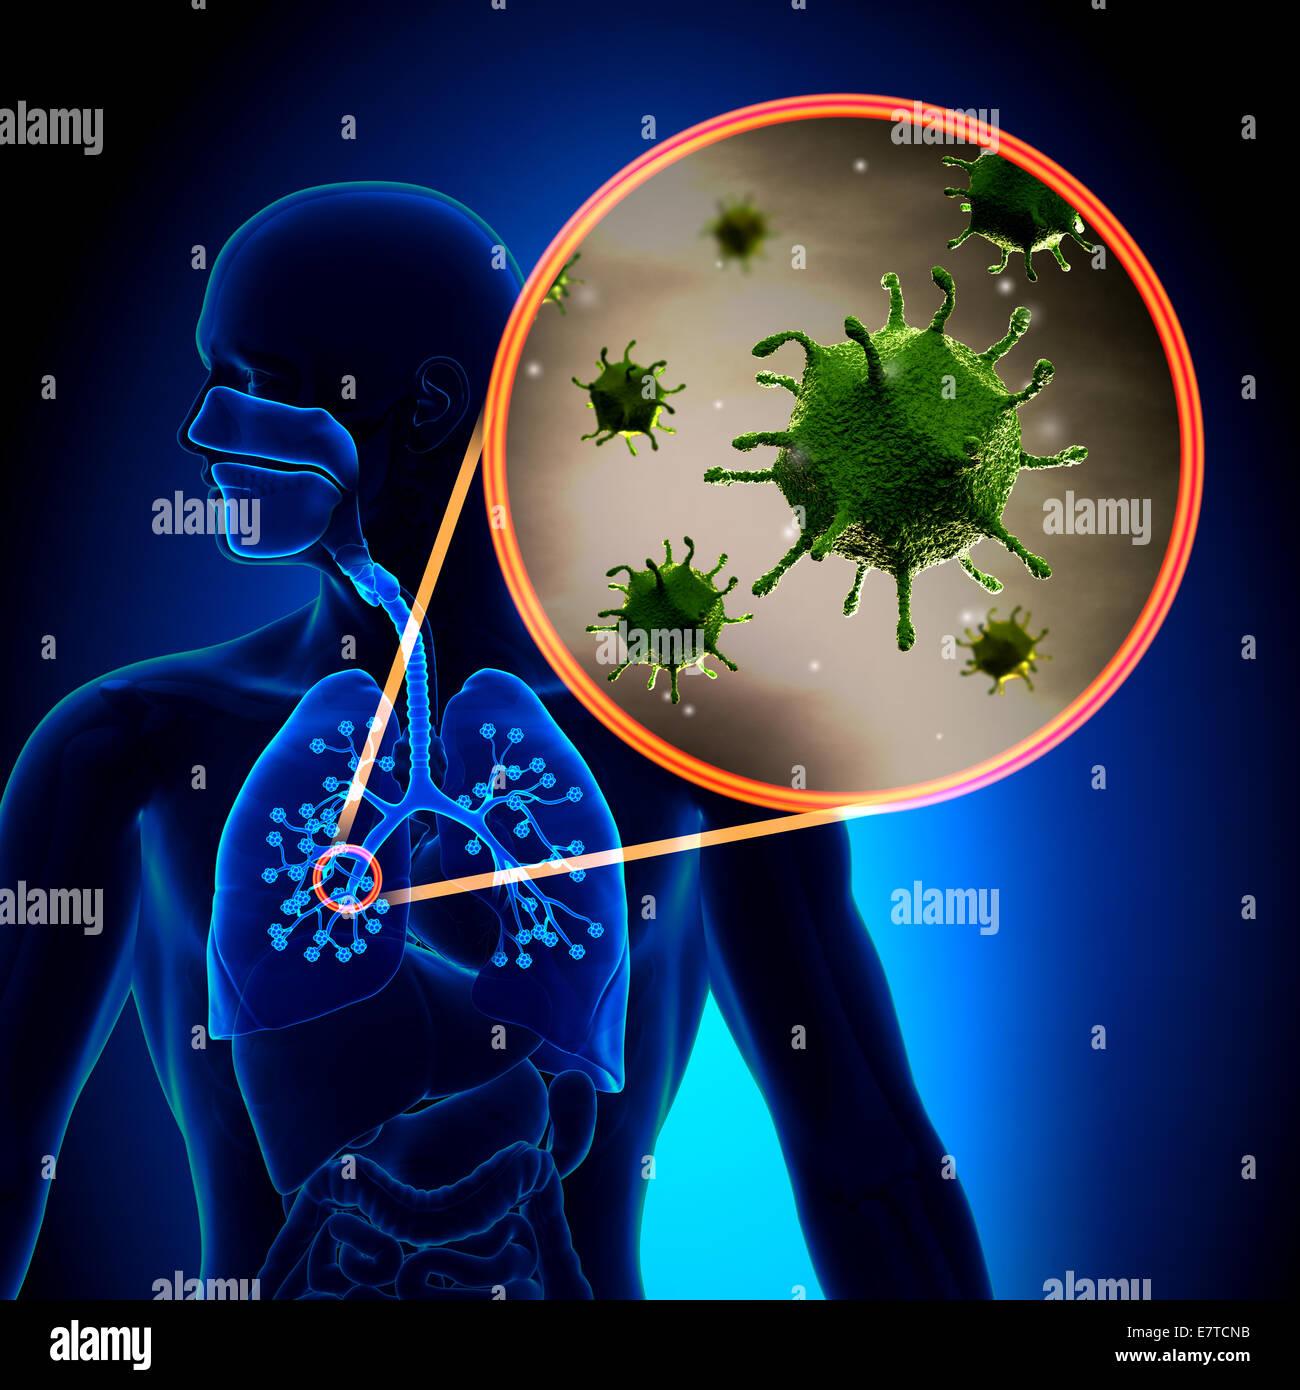 Flu / Cold Virus - Stock Image